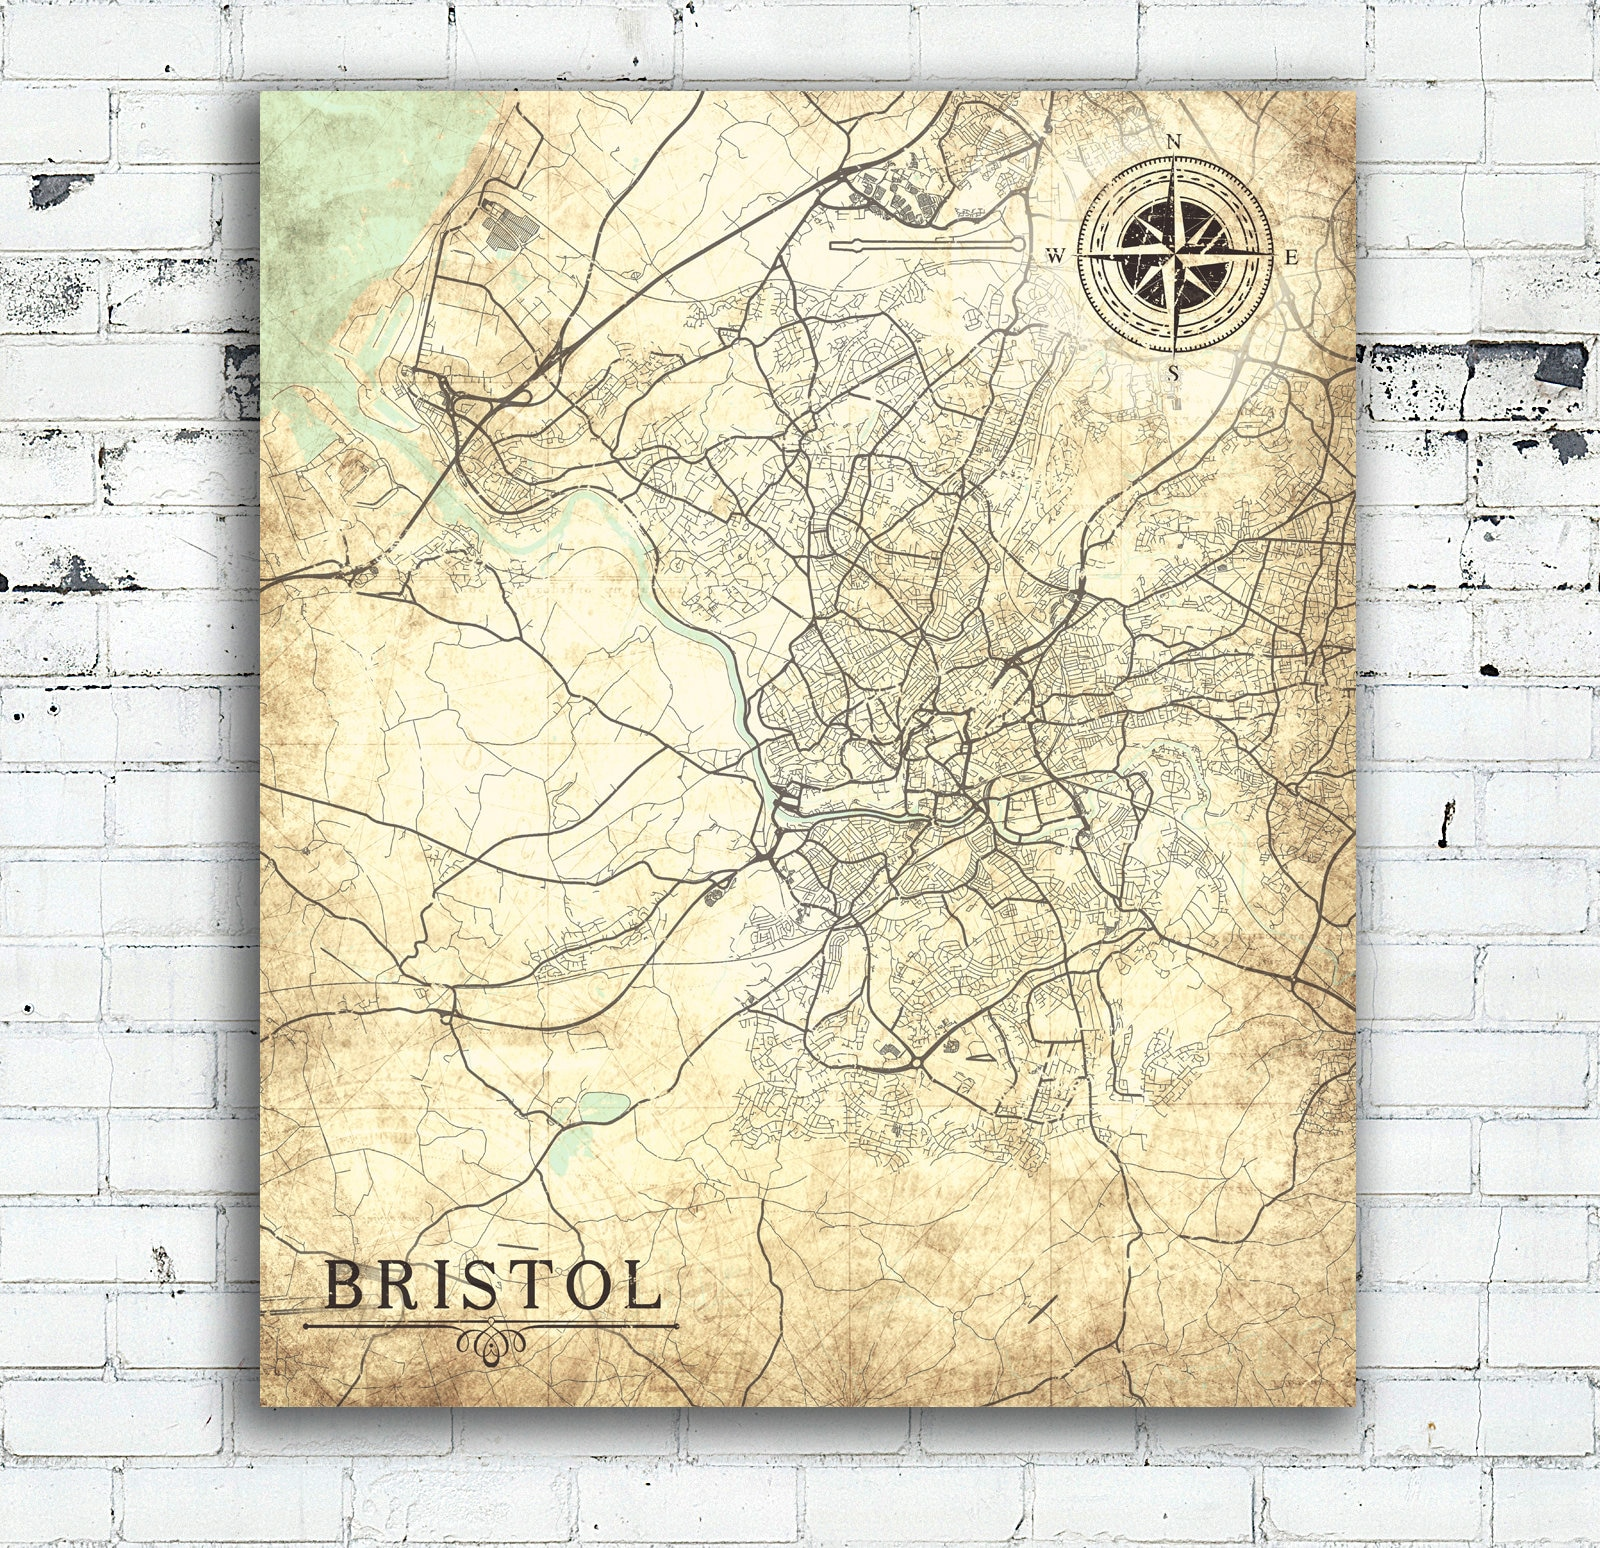 Map Of England Vintage.Bristol Uk Canvas Print England Vintage City Map Gb United Etsy